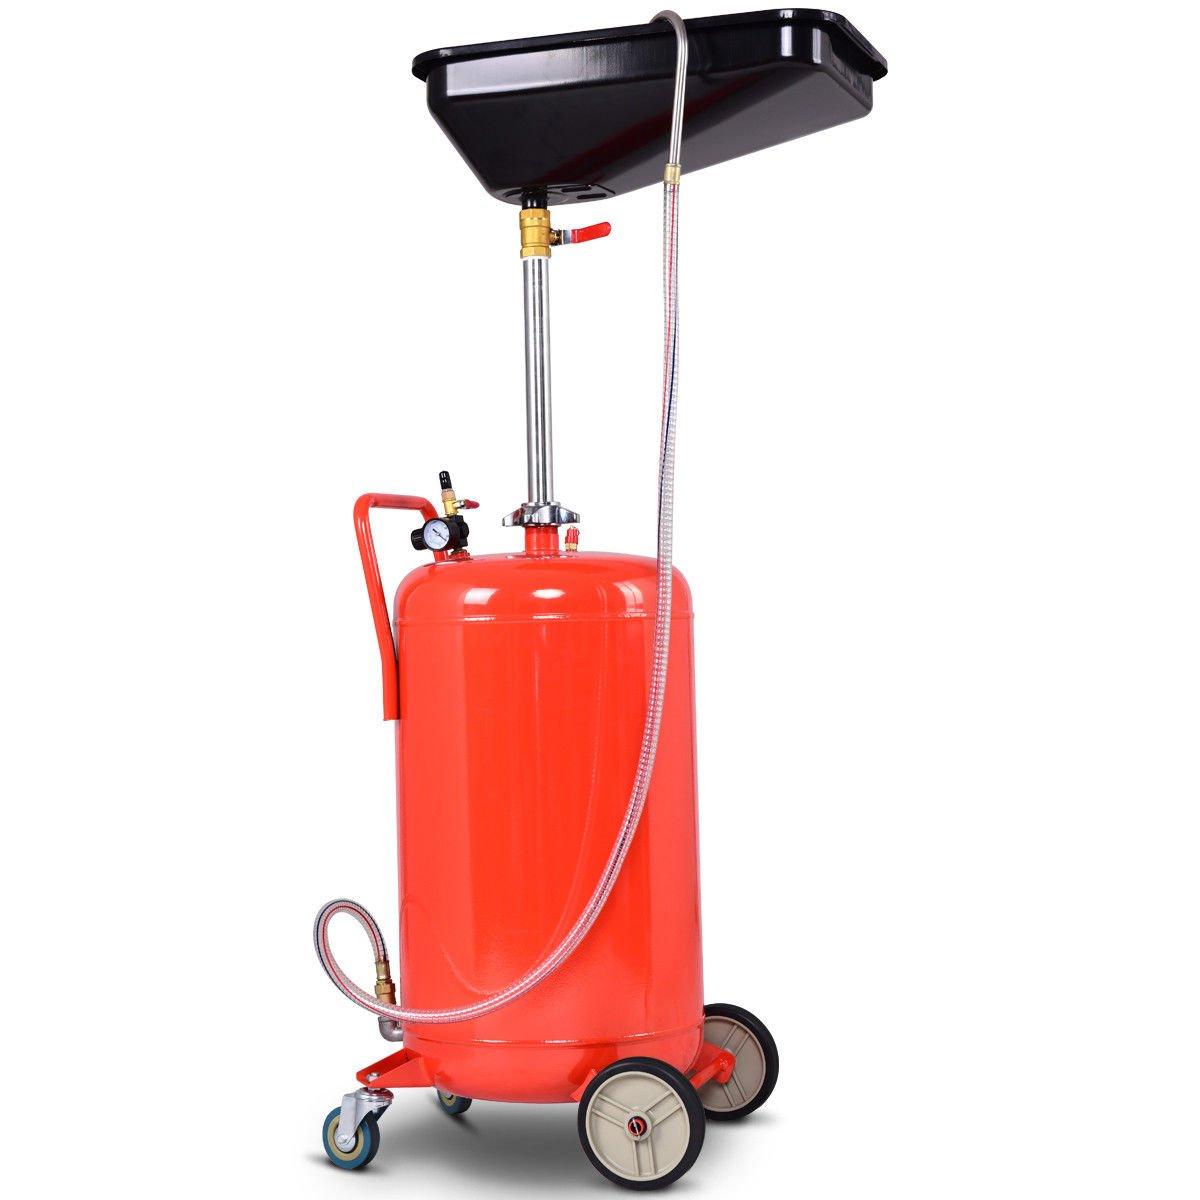 64'' Swivel Wheels Portable Waste Oil Drain Tank Air Operated Triangular Shape Pan18 Gallon w/Adjustable Height